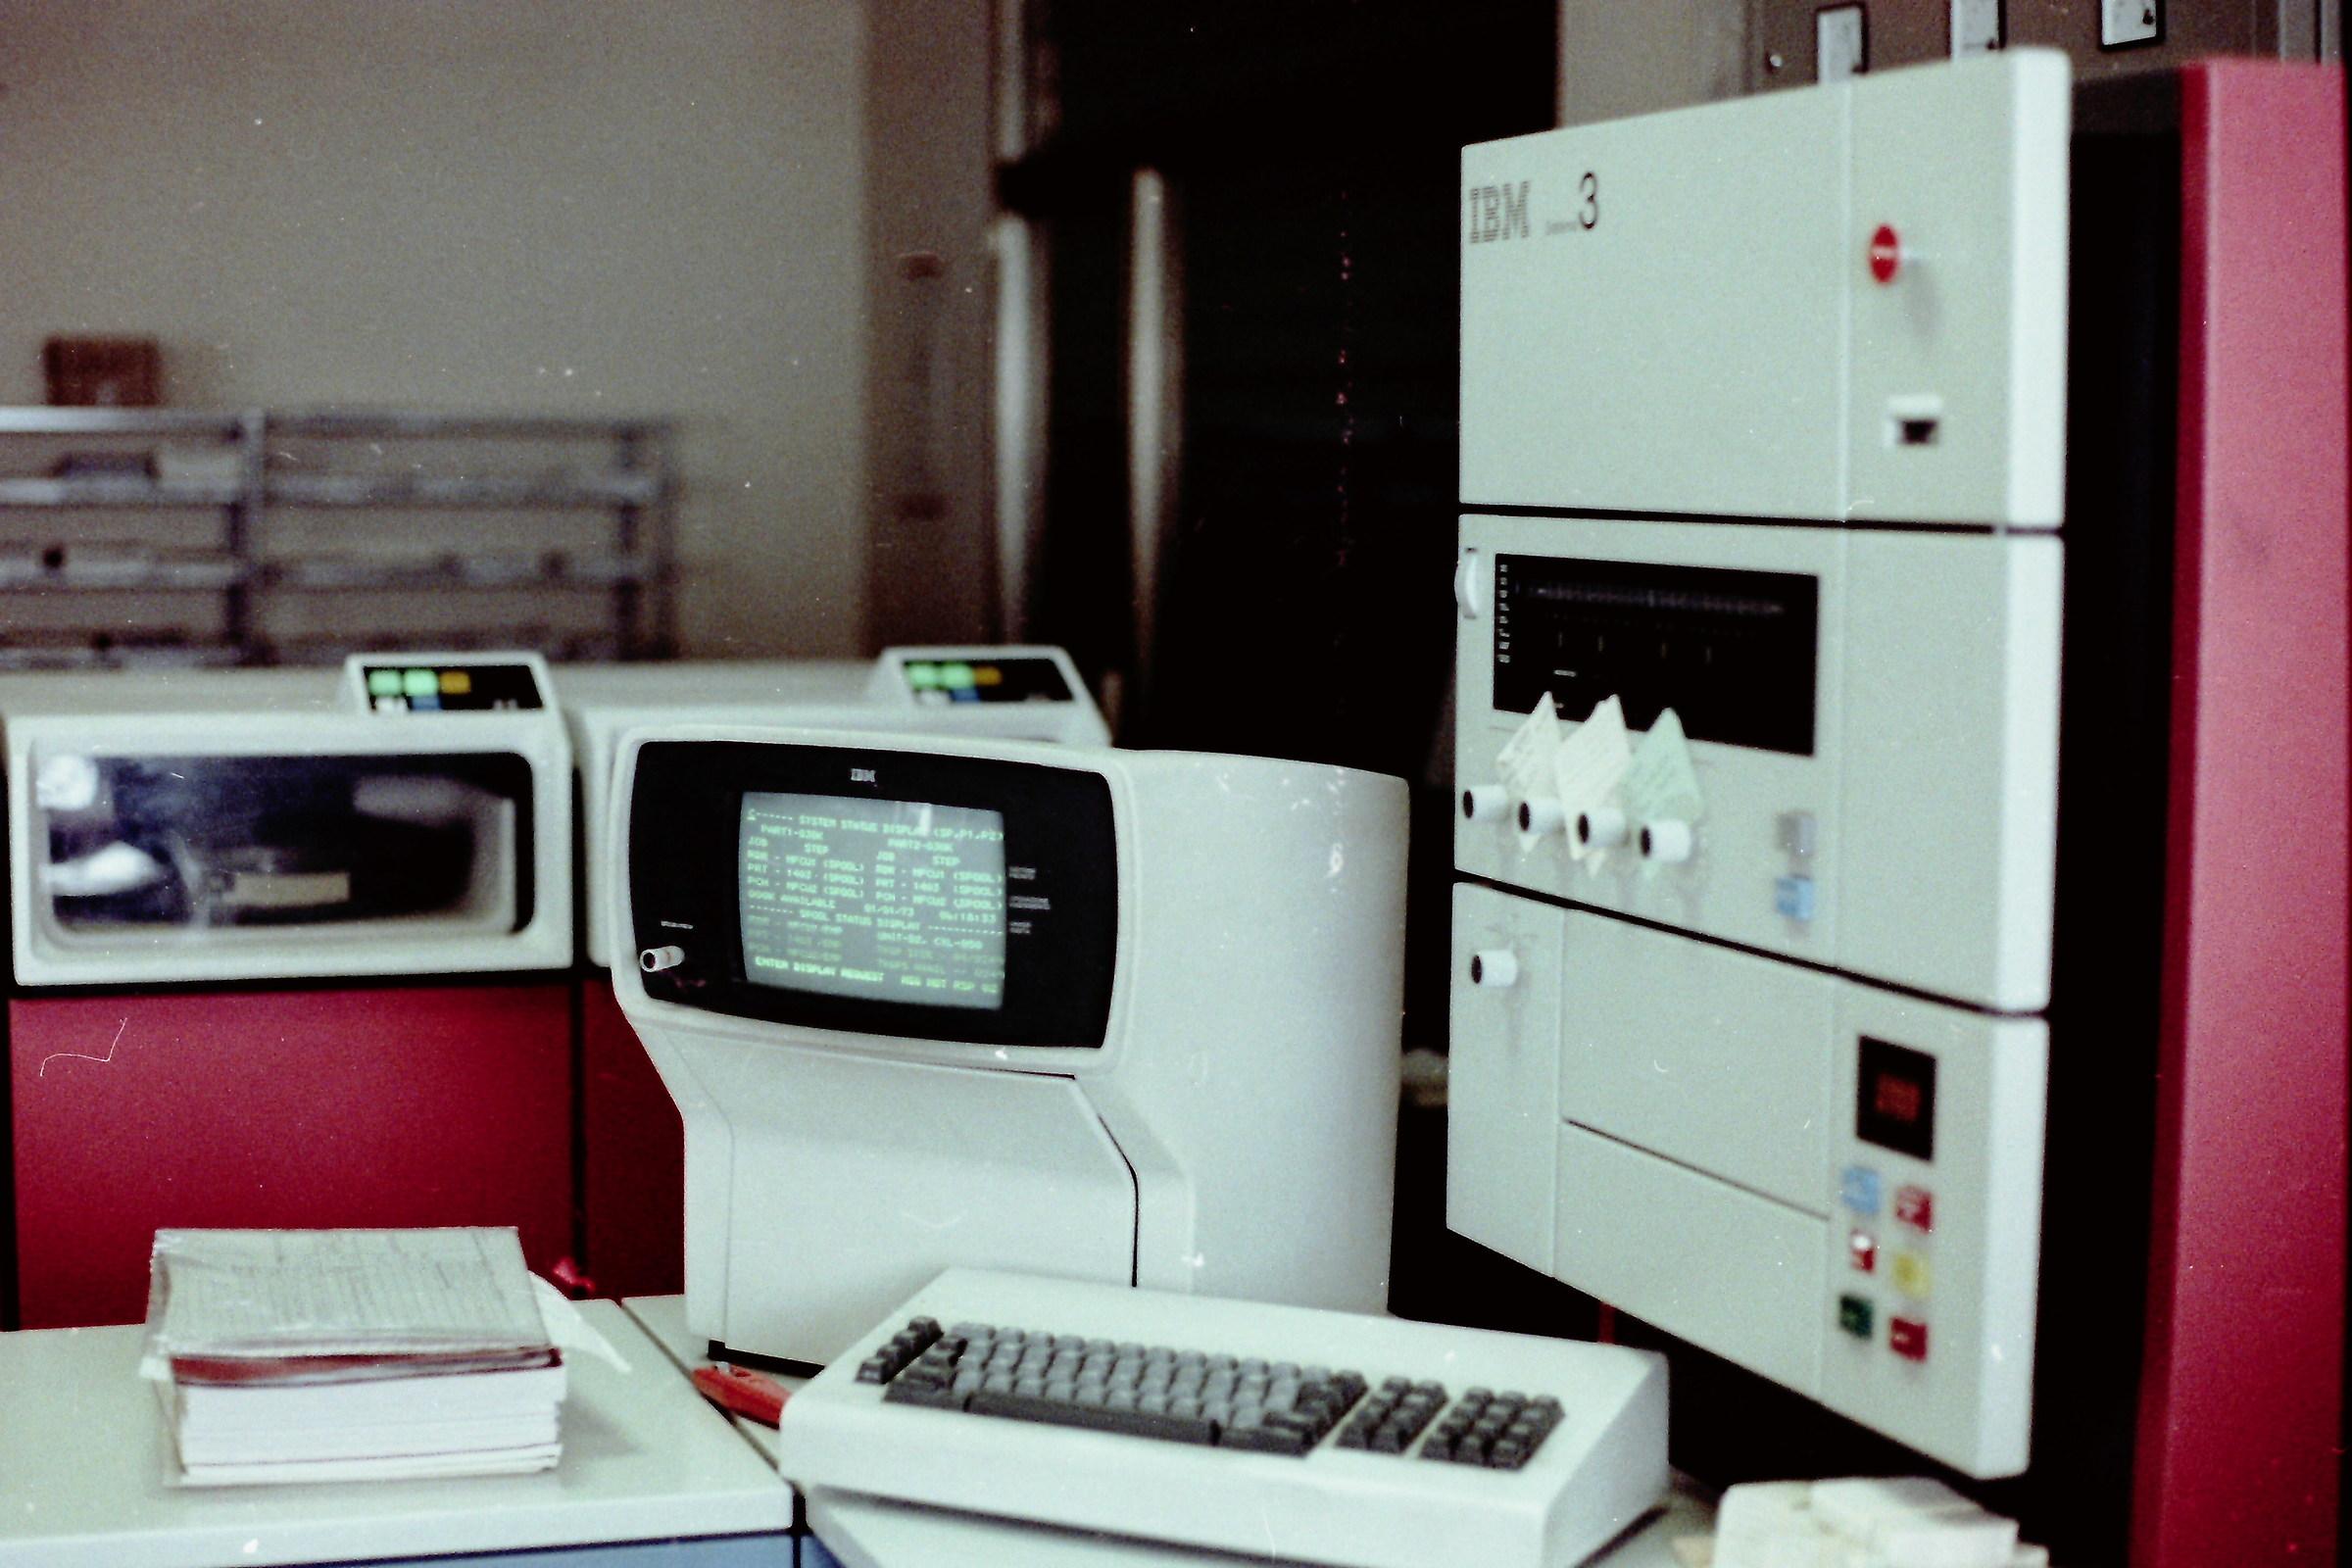 Year 1979. Console computer S / 3 Mod.15 IBM...